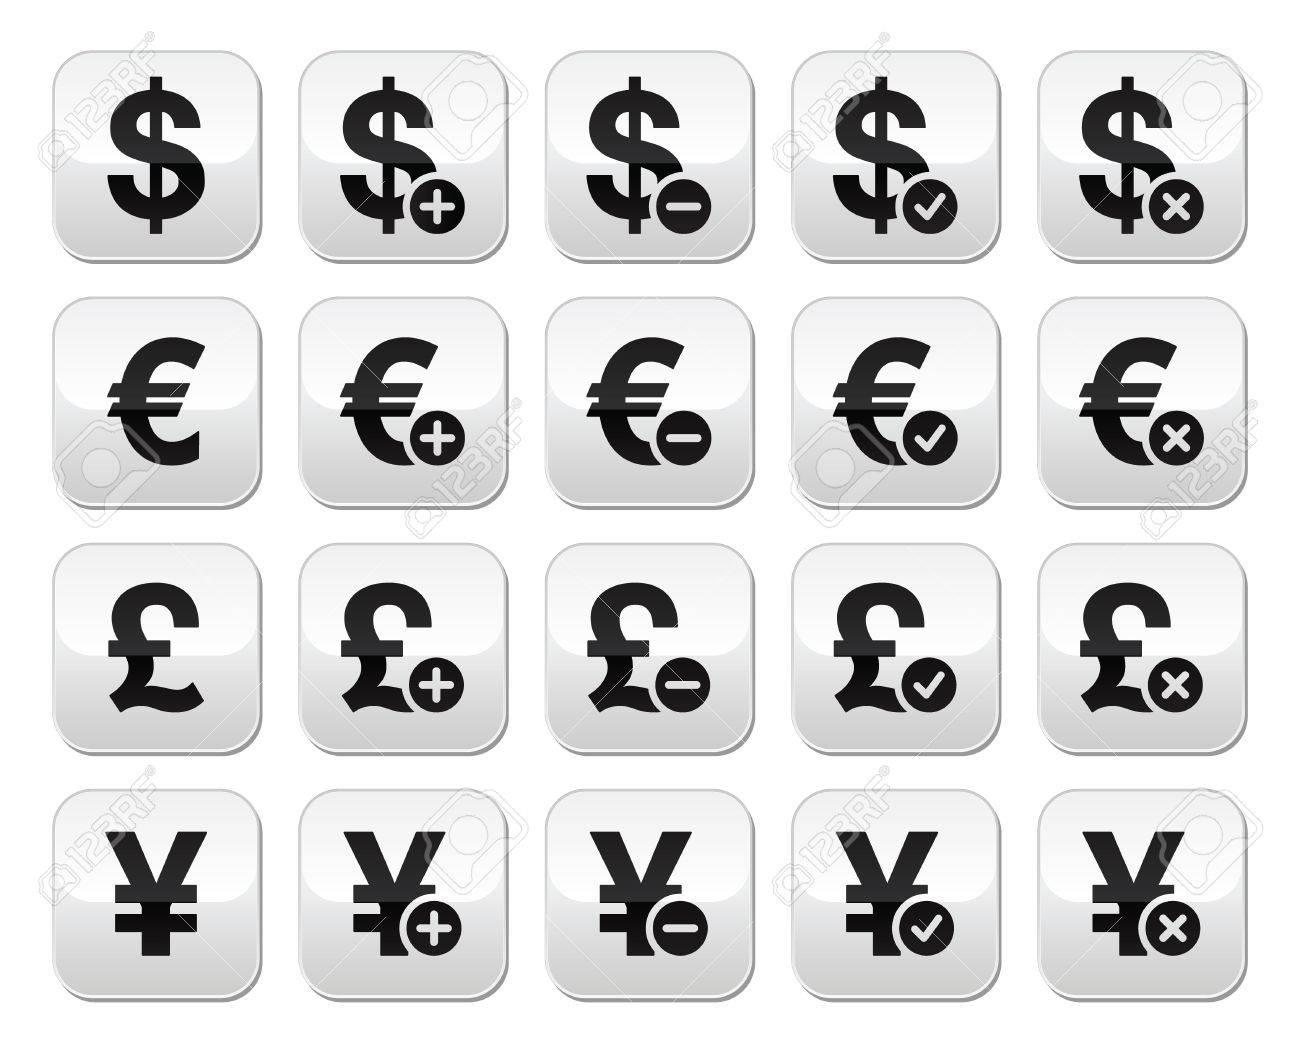 Bureau De Change Boutons Serie Dollar Euro Yen Livre Sterling